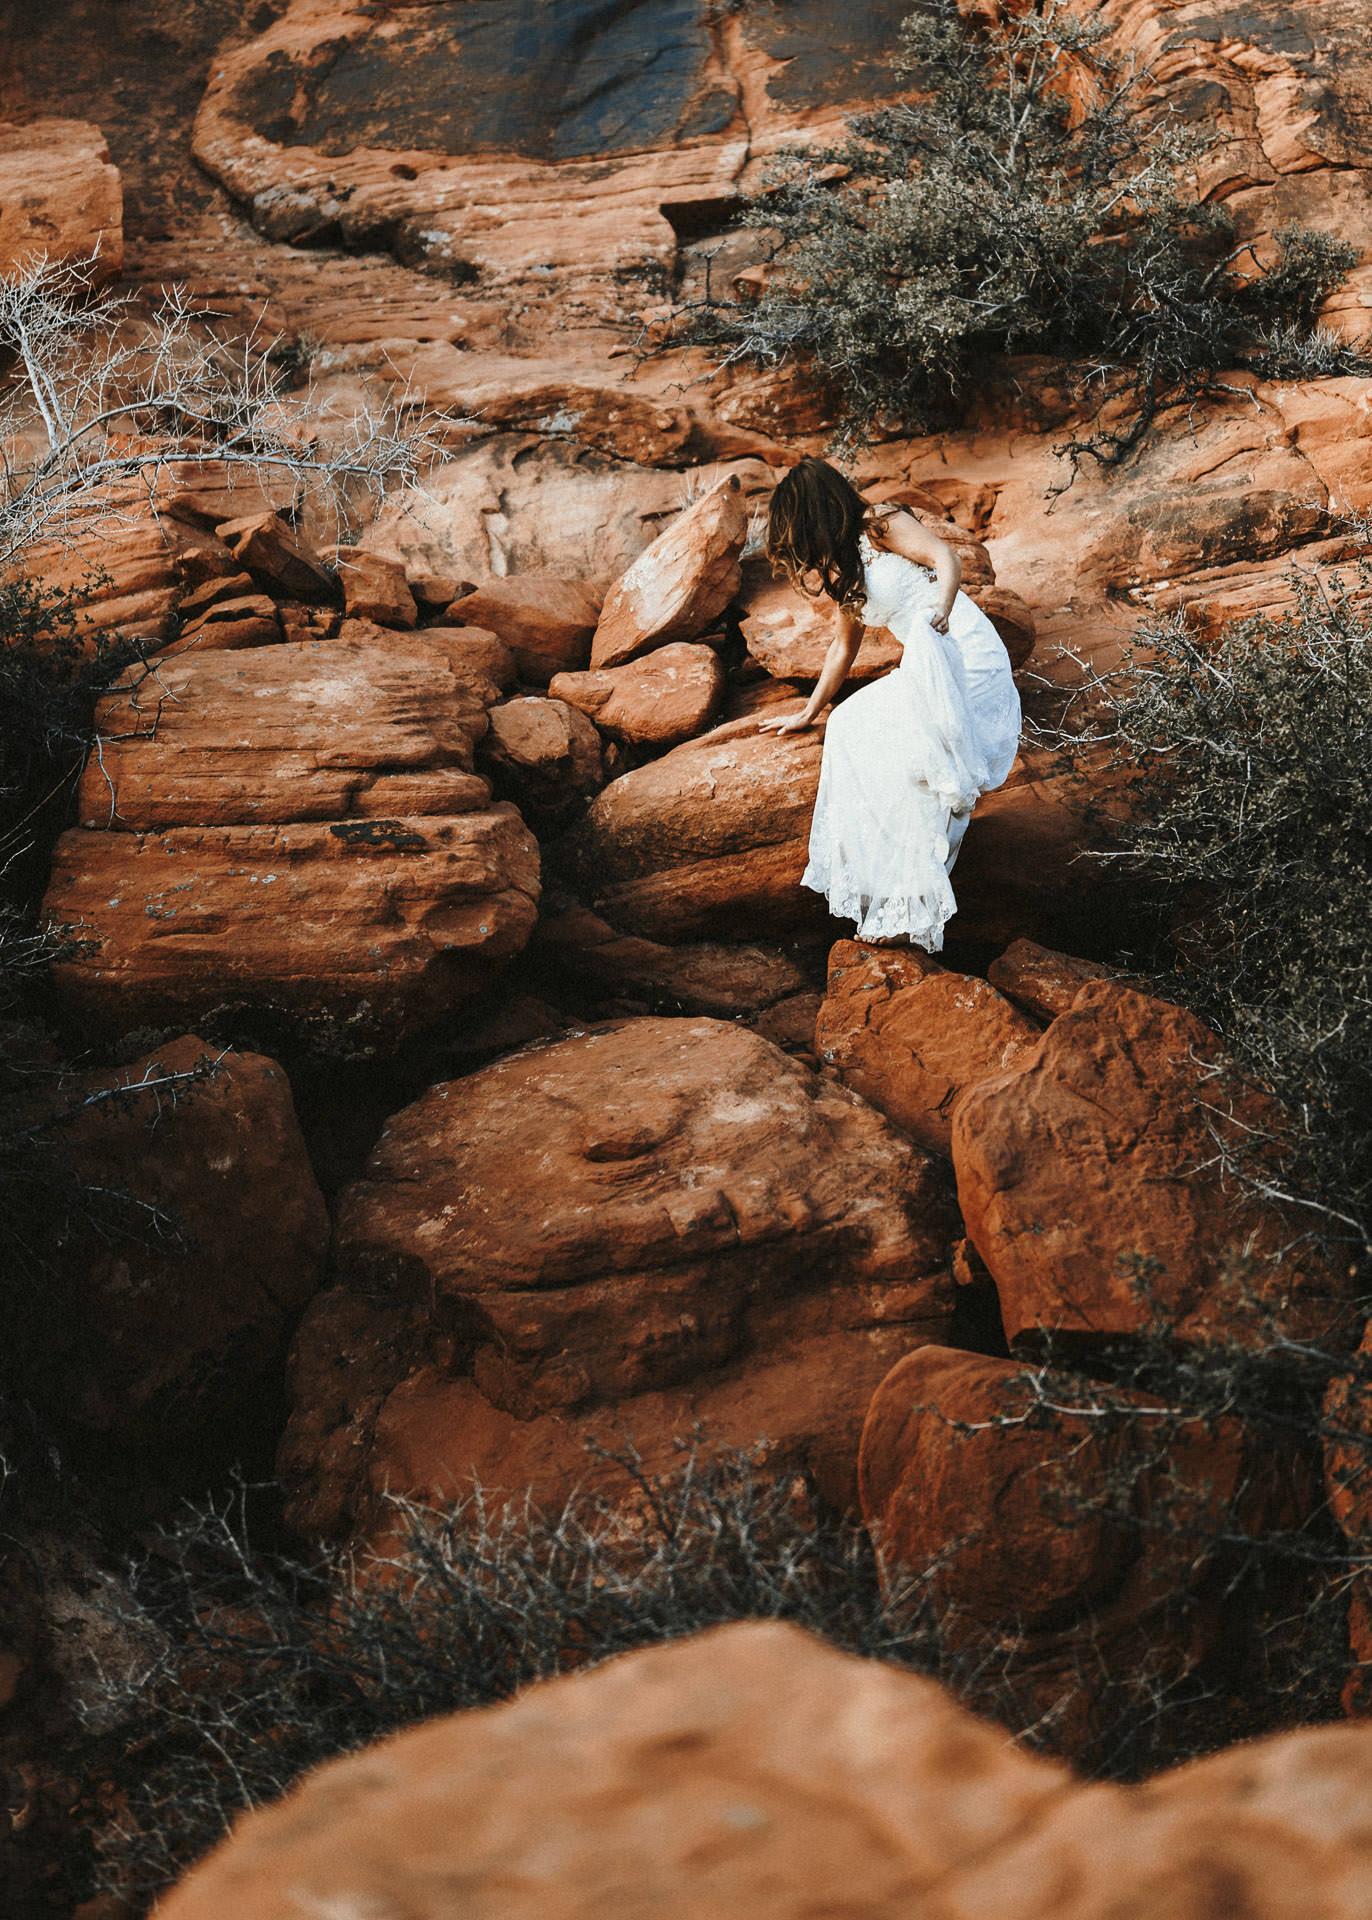 Twisted-oaks-studio-wppi-leica-red-rock-canyon-0008.jpg